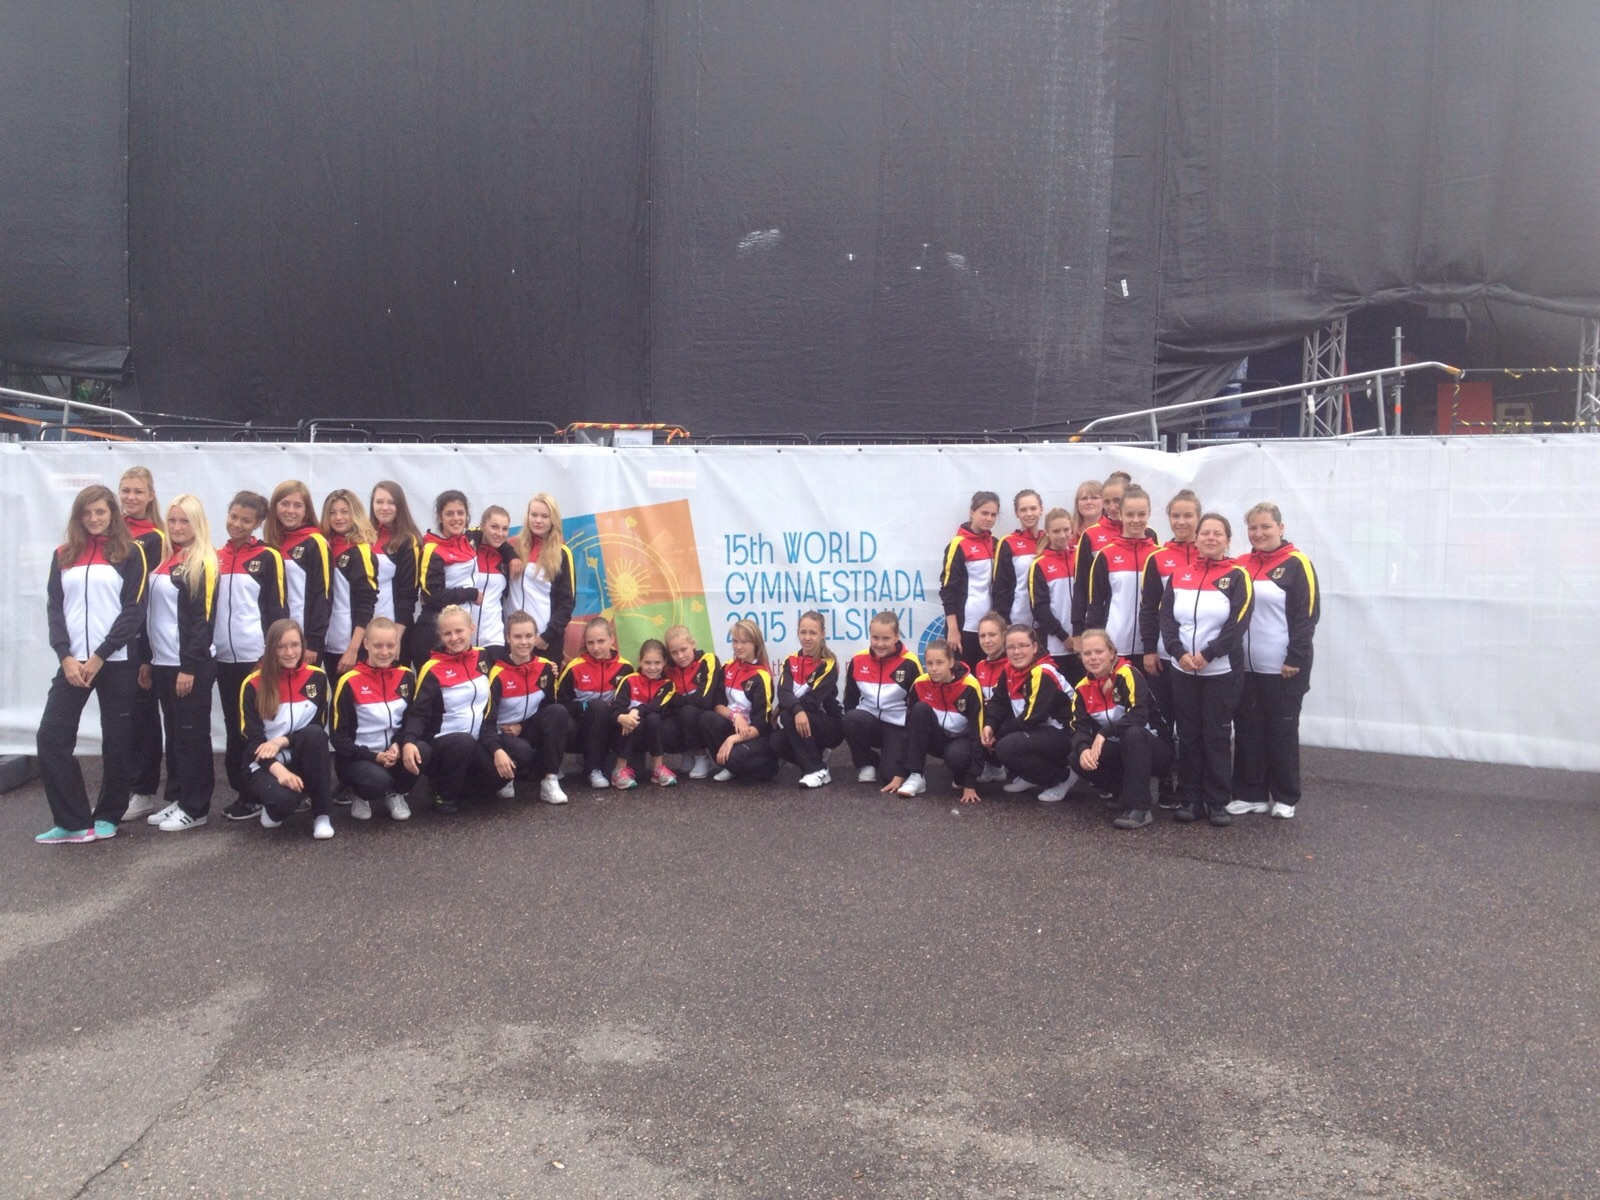 Weltgymnaestrada 2015 - Das  in Helsinki